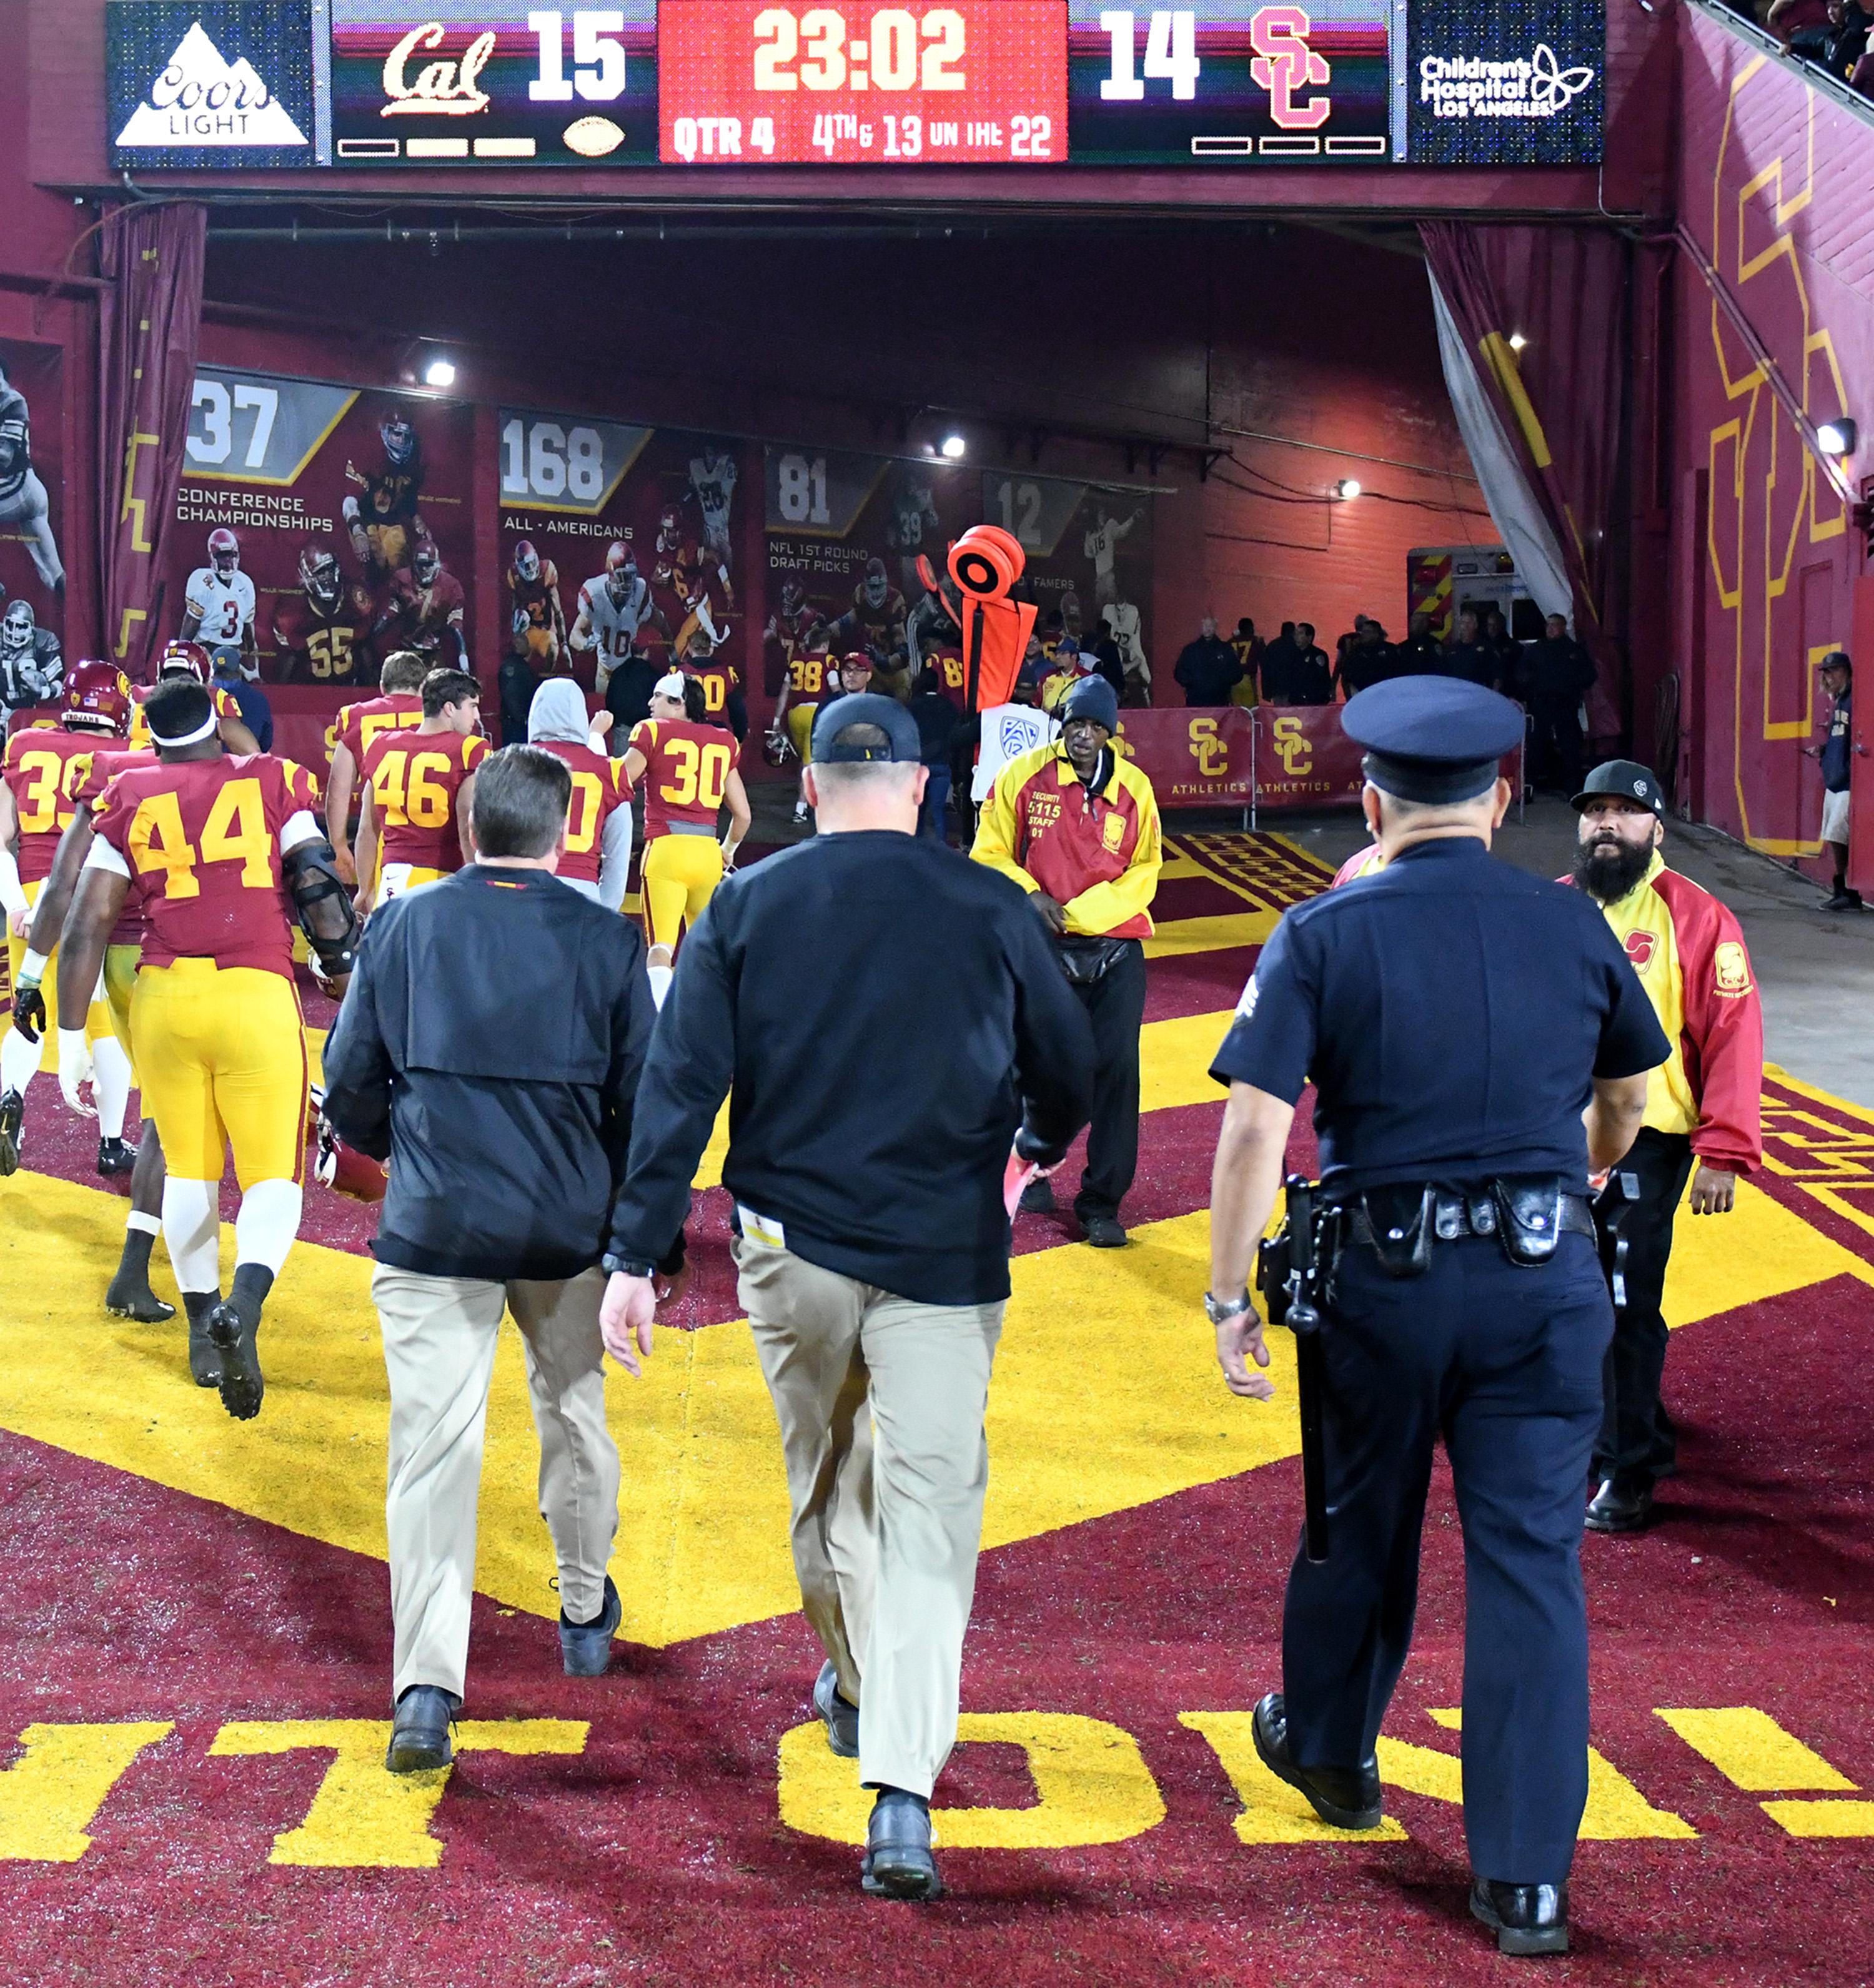 California Golden Bears defeated the USC Trojans 15-14